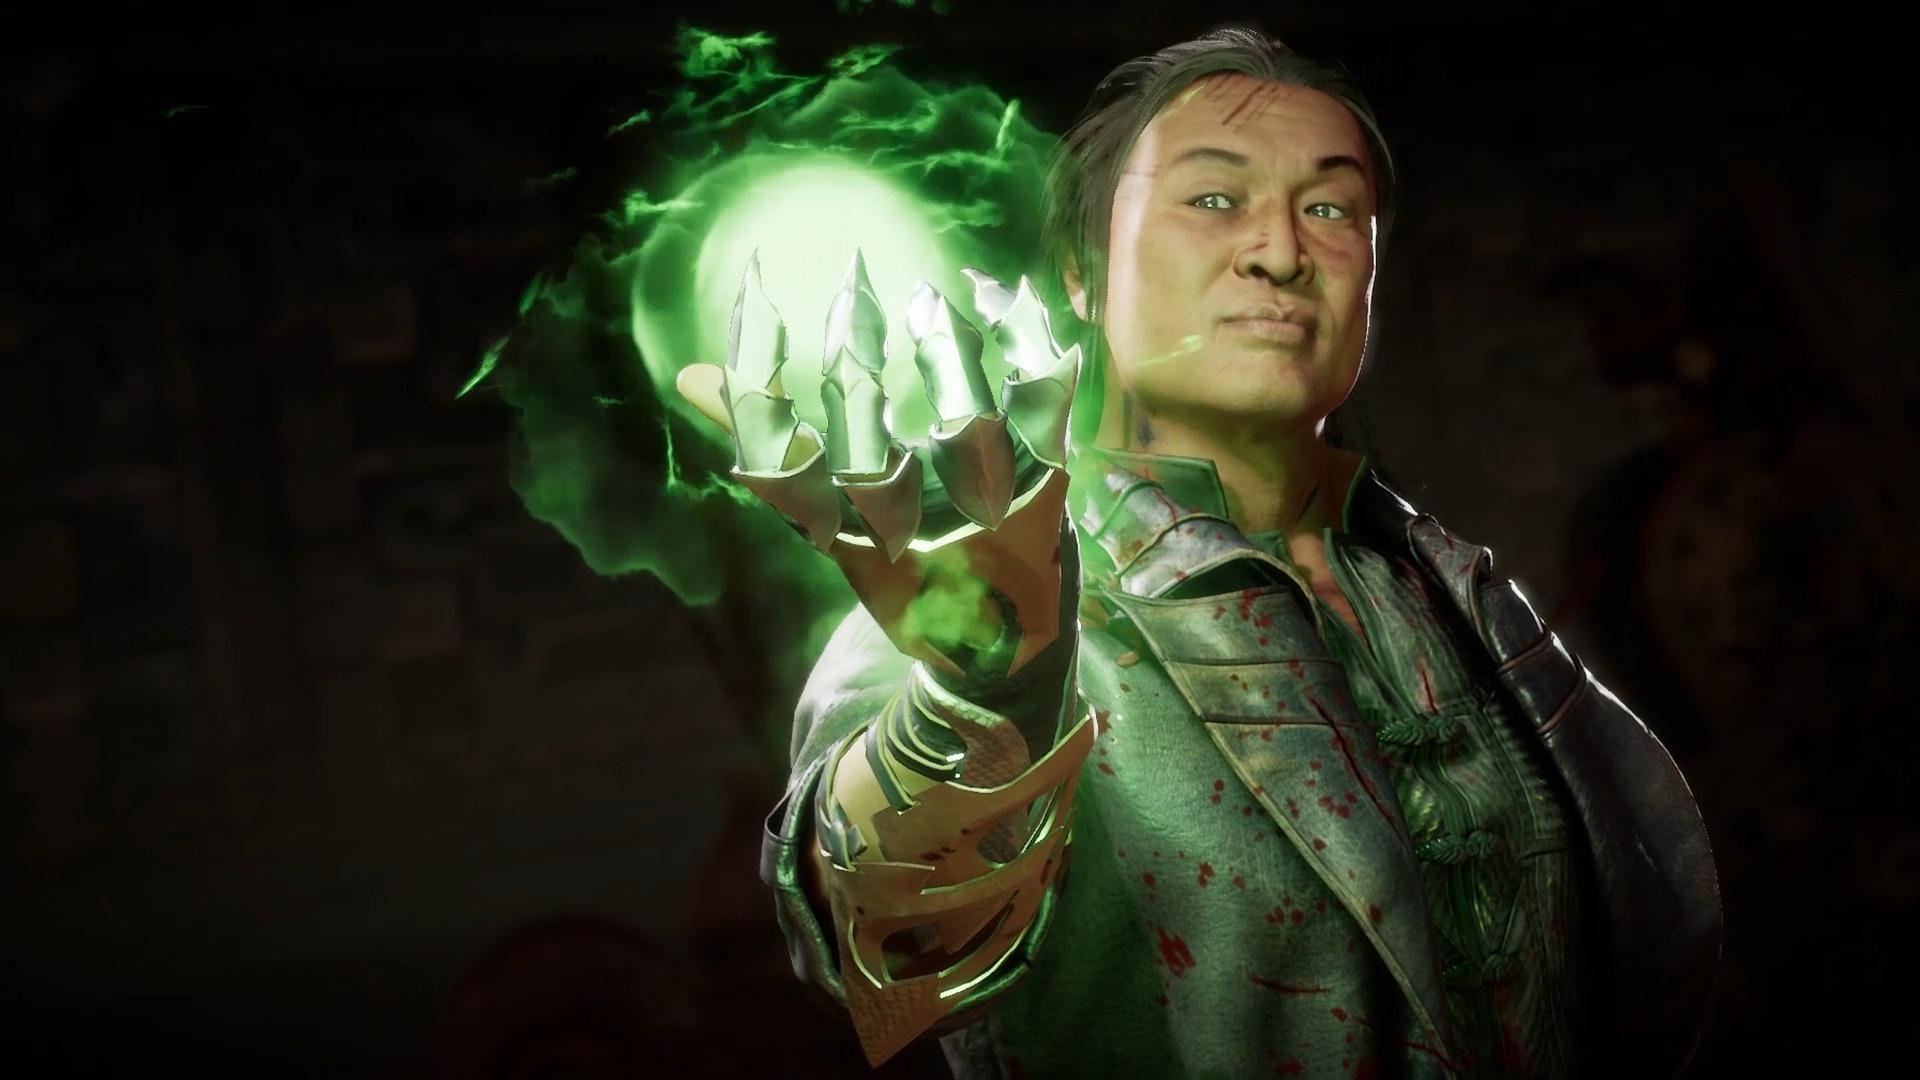 Mortal Kombat 11 Shang Tsung Hands On Impressions His Soul Is